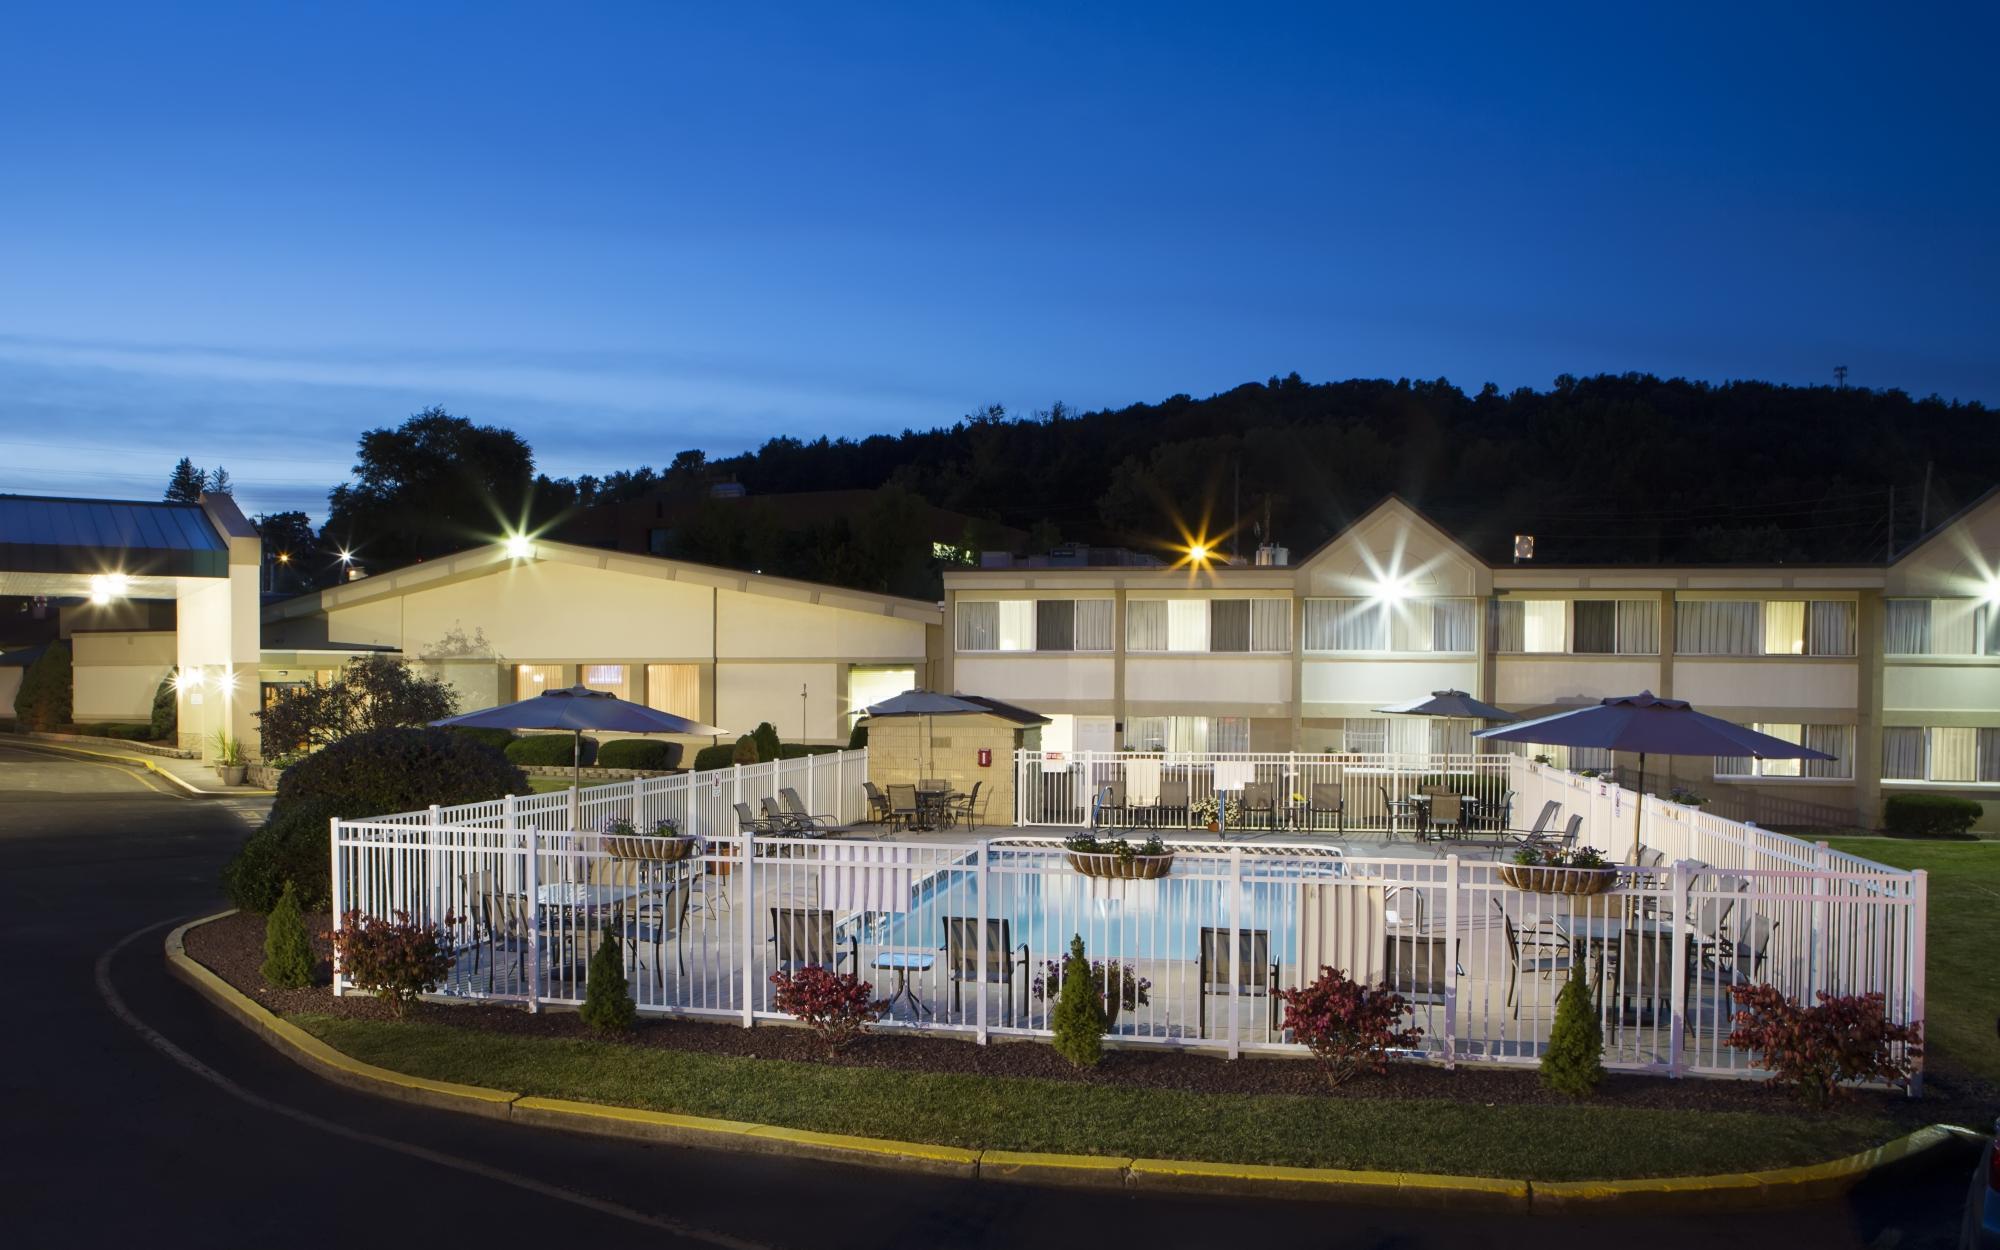 Quality Inn & Suites at Binghamton University